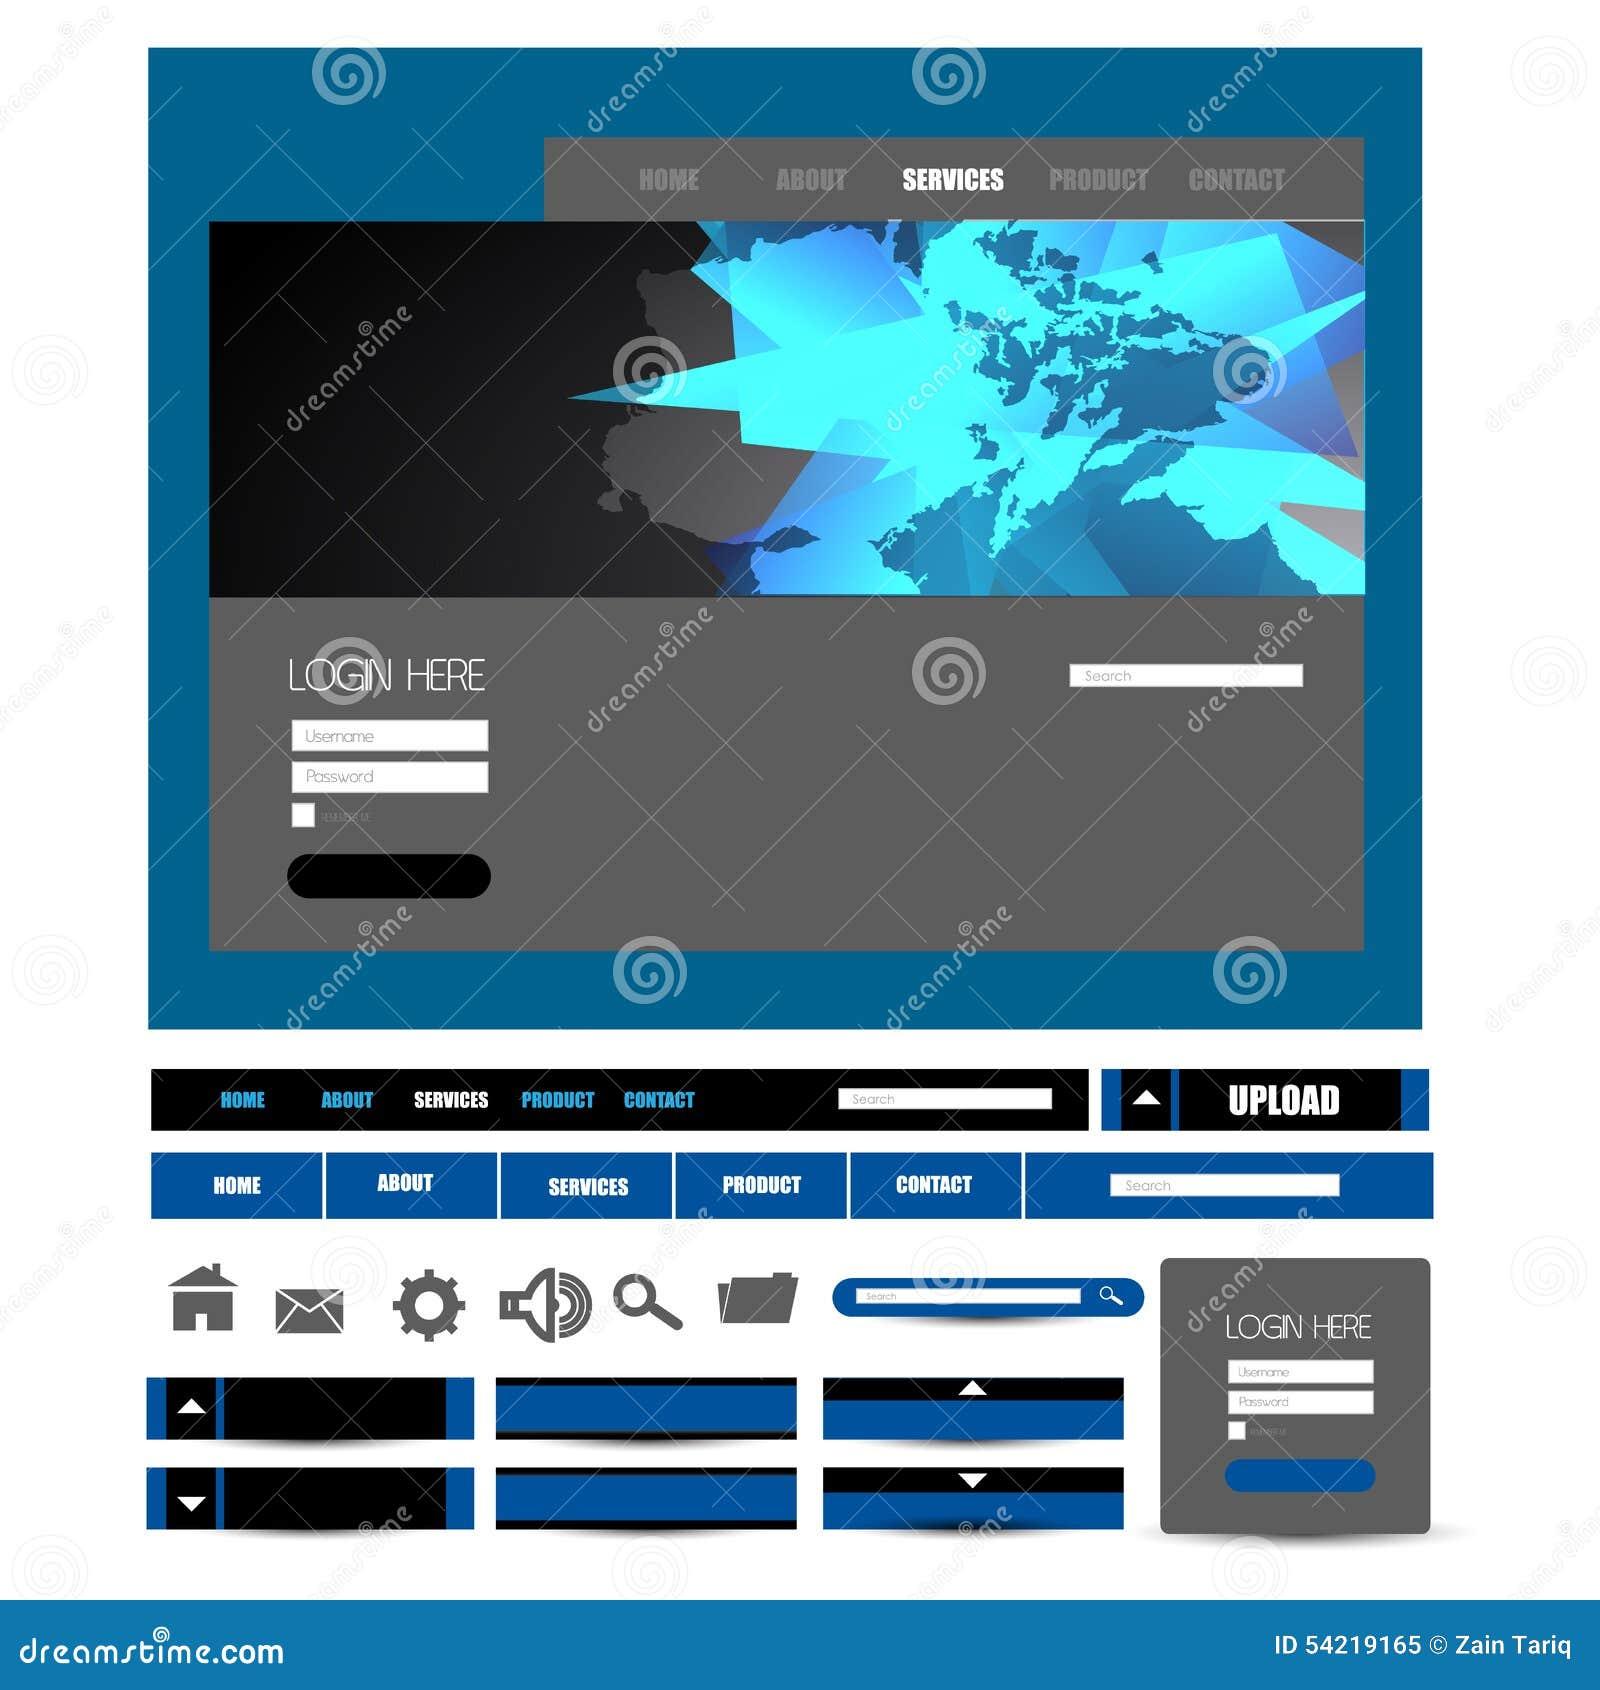 Stylish website template - portfolio layout with interface elements